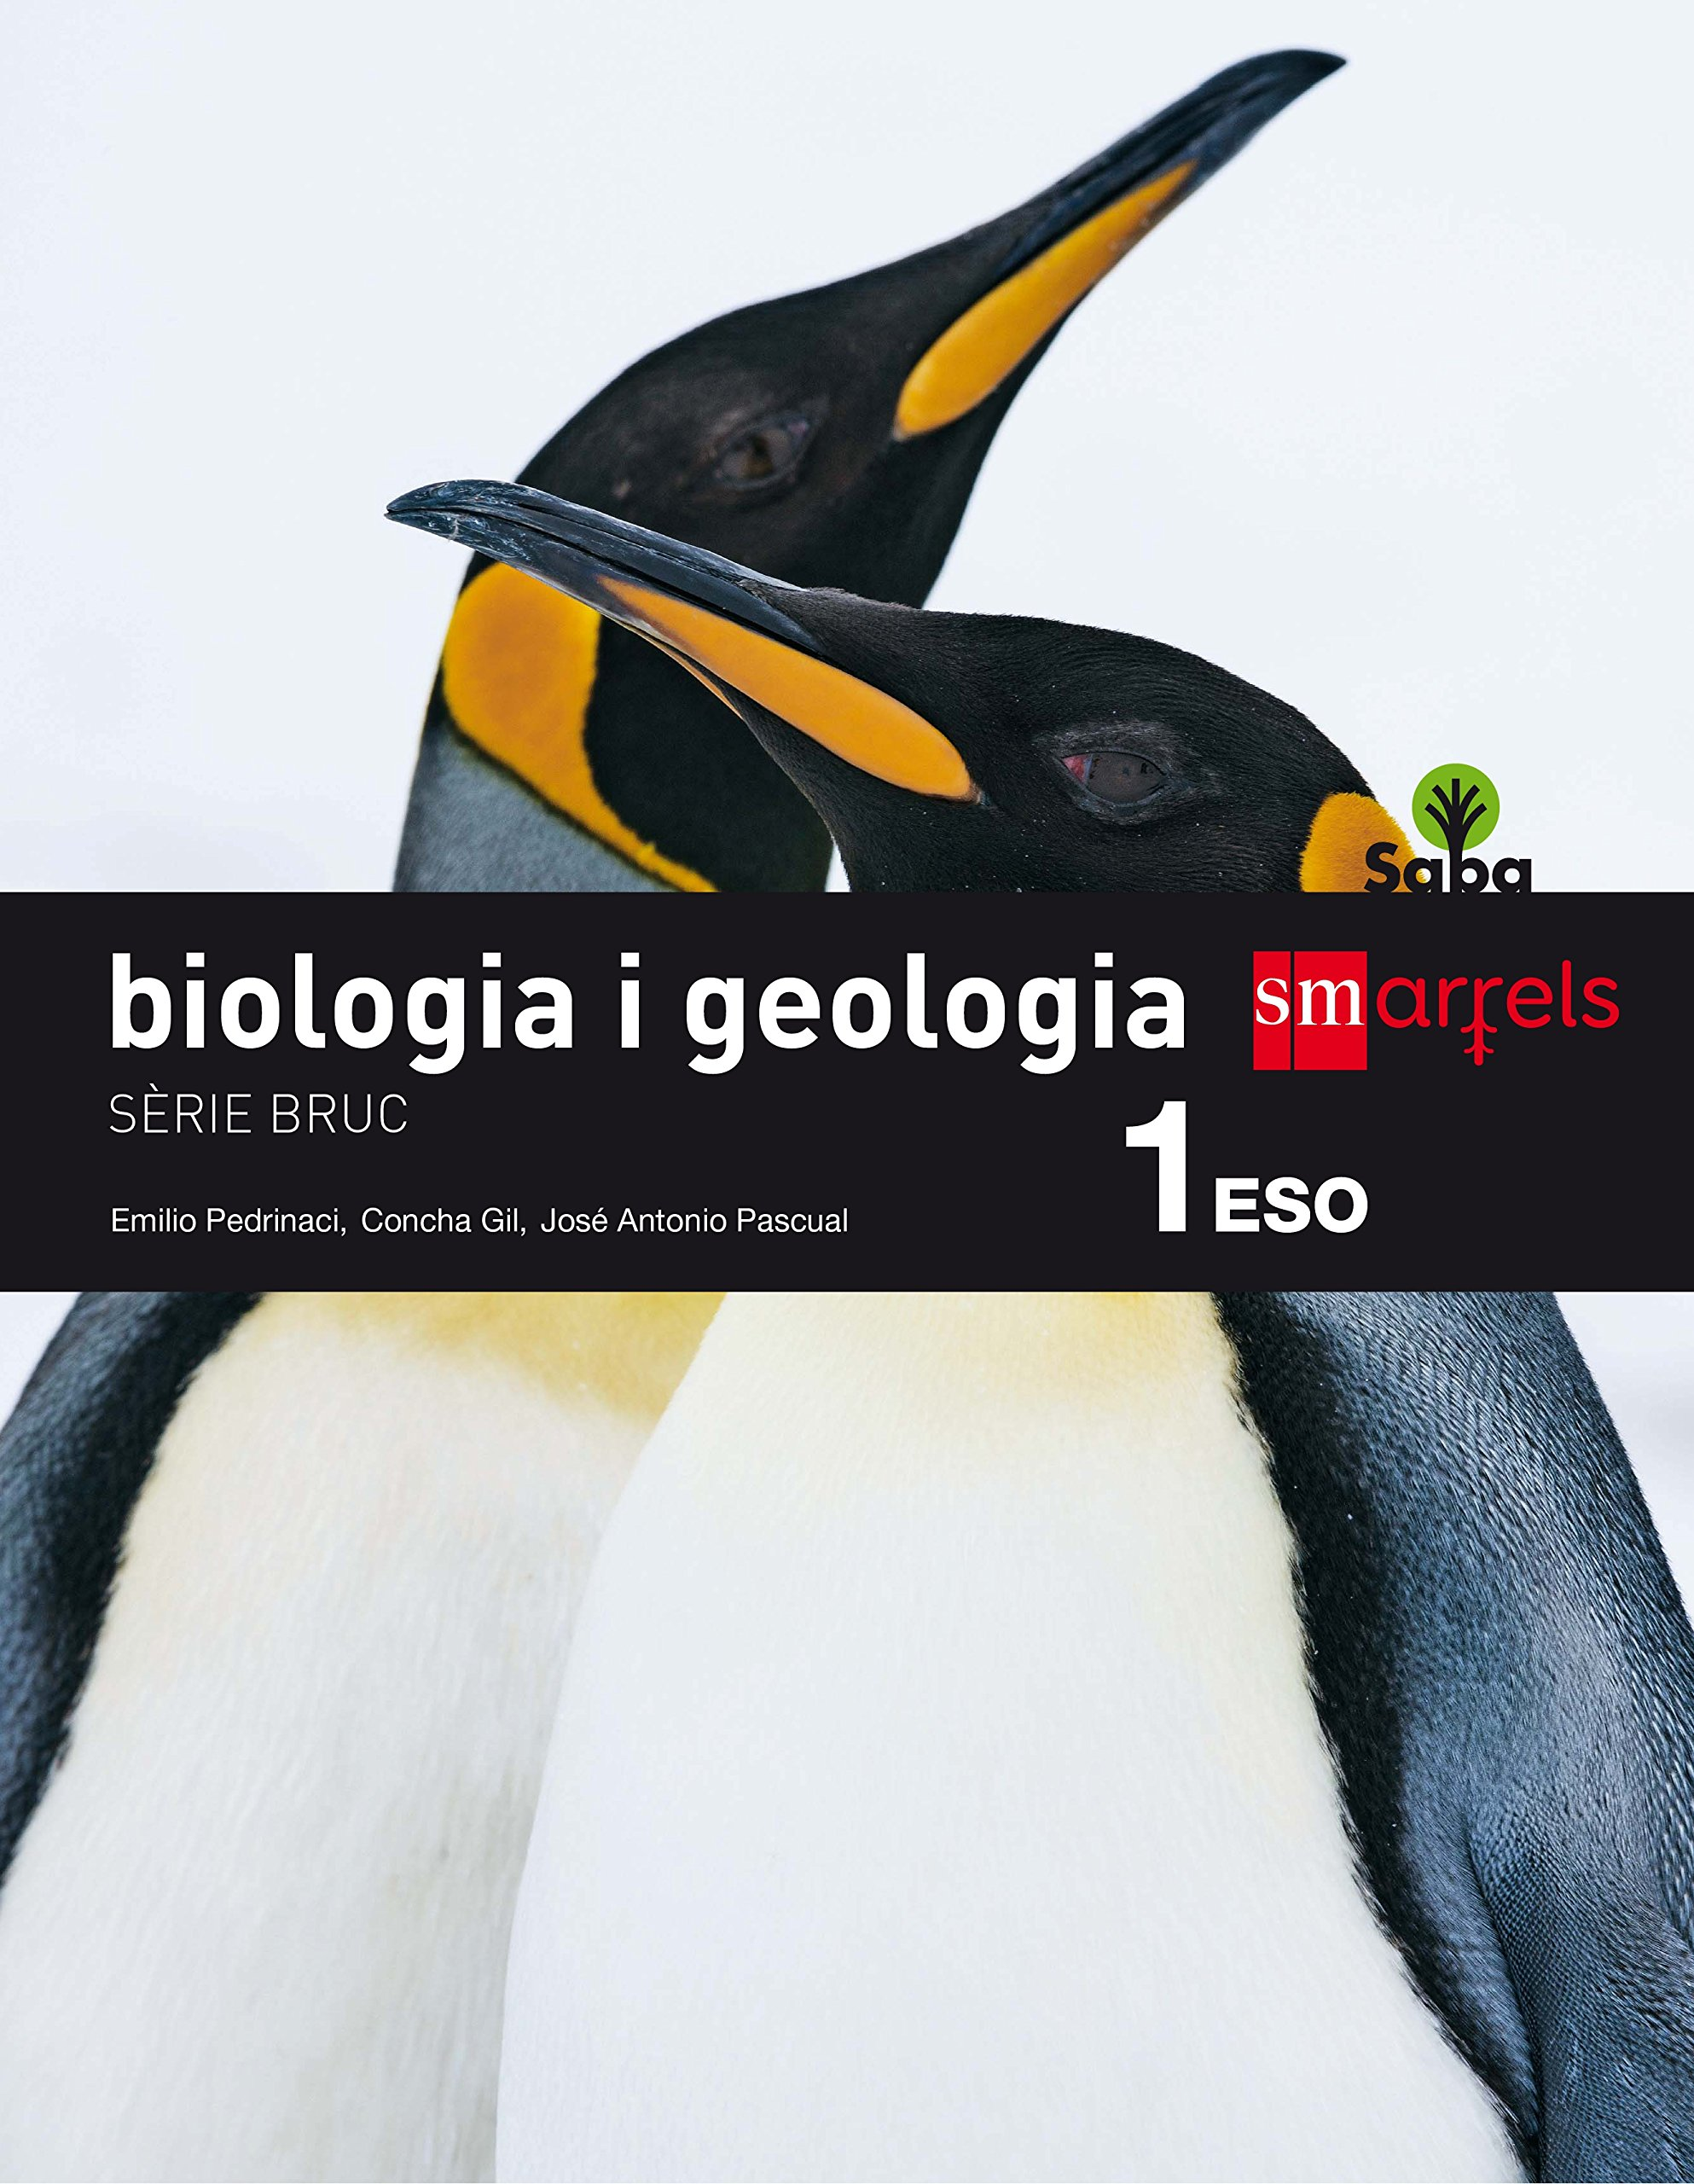 Biologia i geologia, Bruc. 1 ESO. Saba - 9788467578669: Amazon.es ...